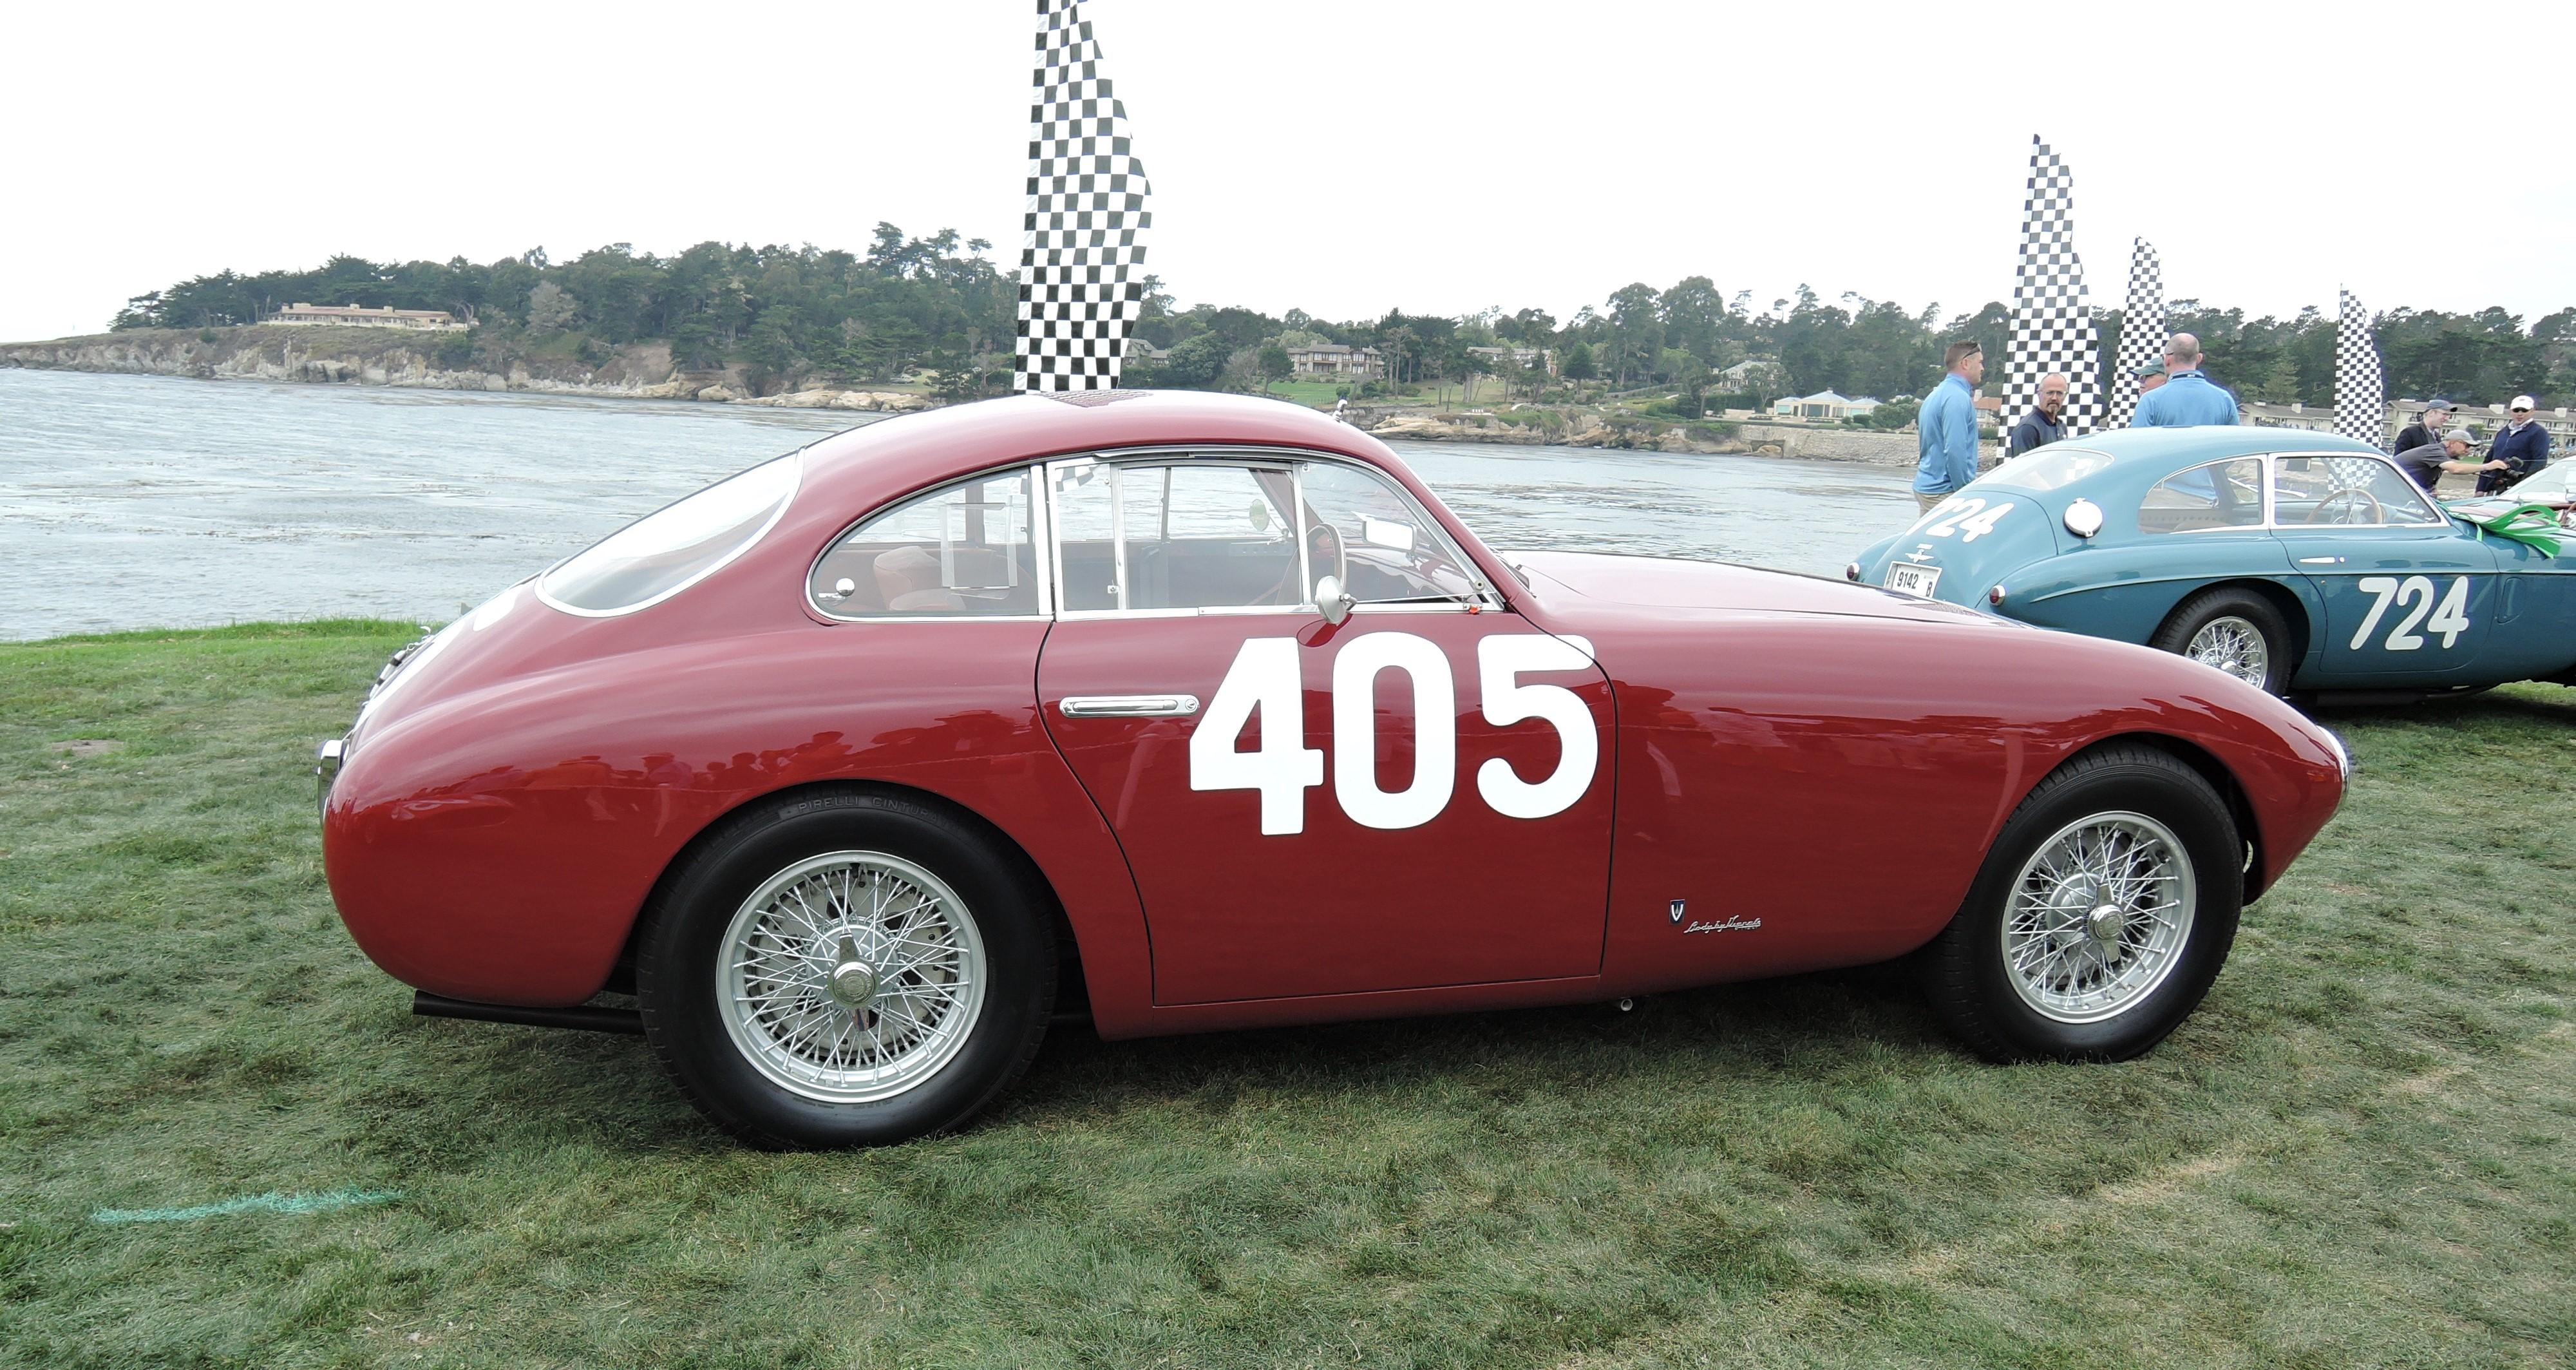 red 1951 Ferrari 340 America Vignale Berlinetta Sn 0082A - Pebble Beach Concours d'Elegance 2017